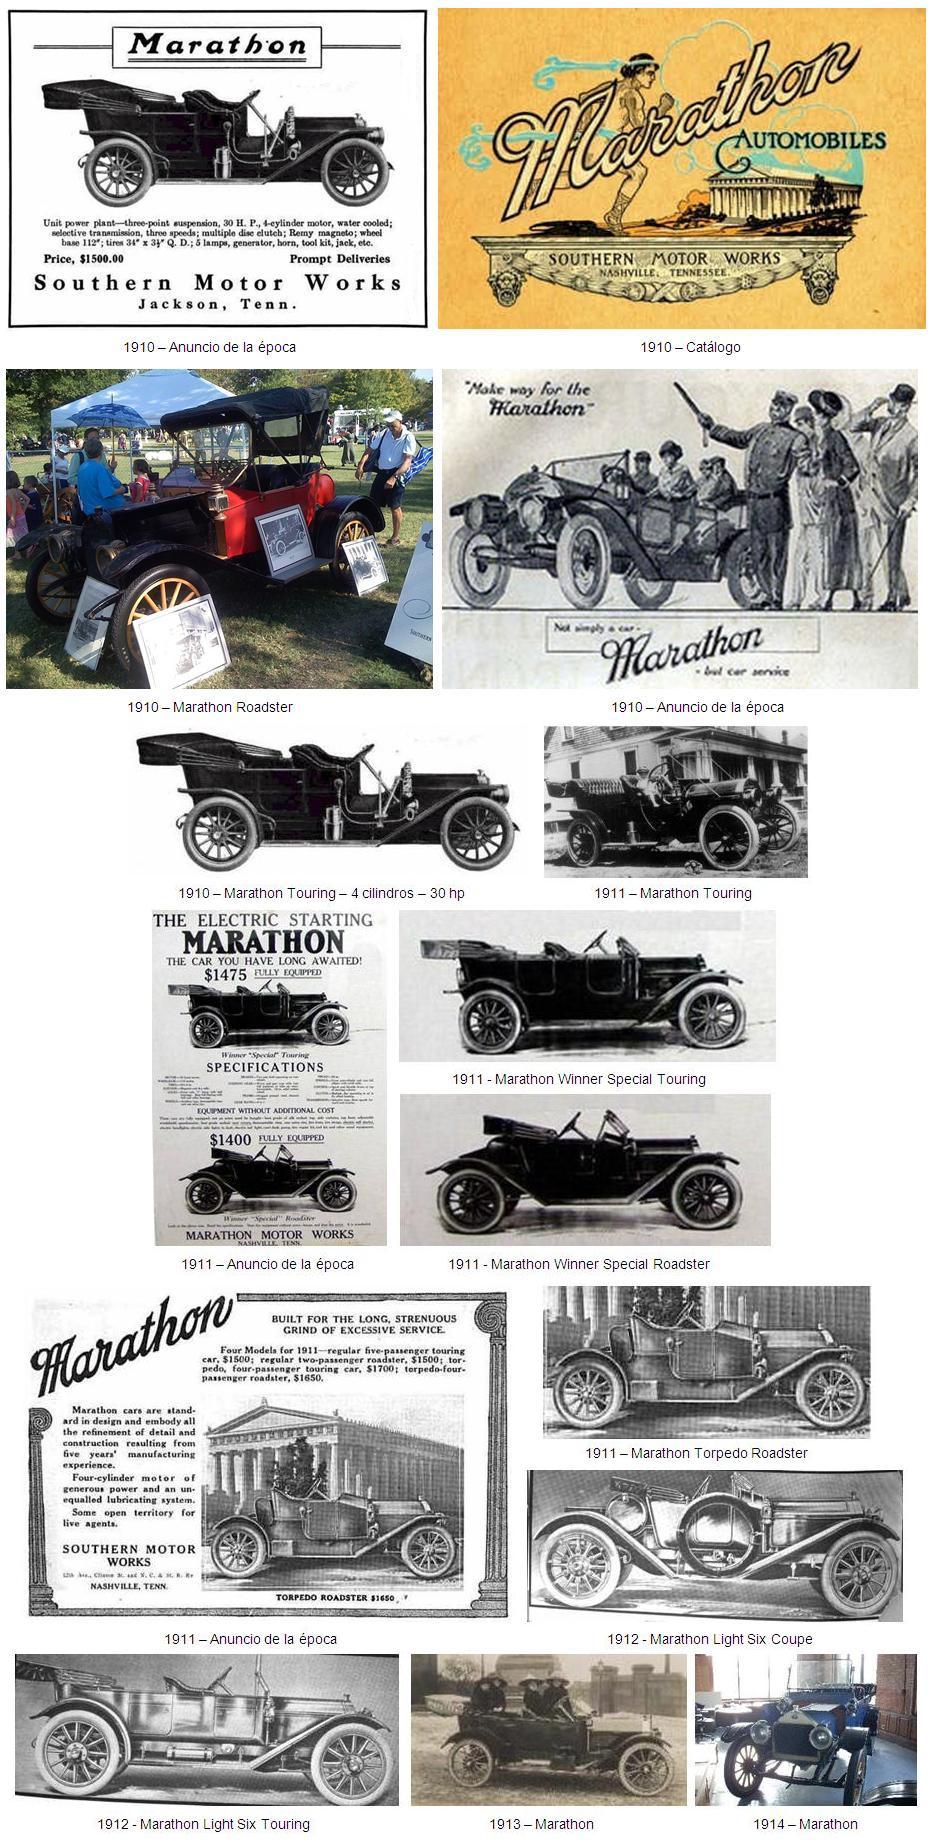 MARATHON (Marathon Motor Works) HISTORIA